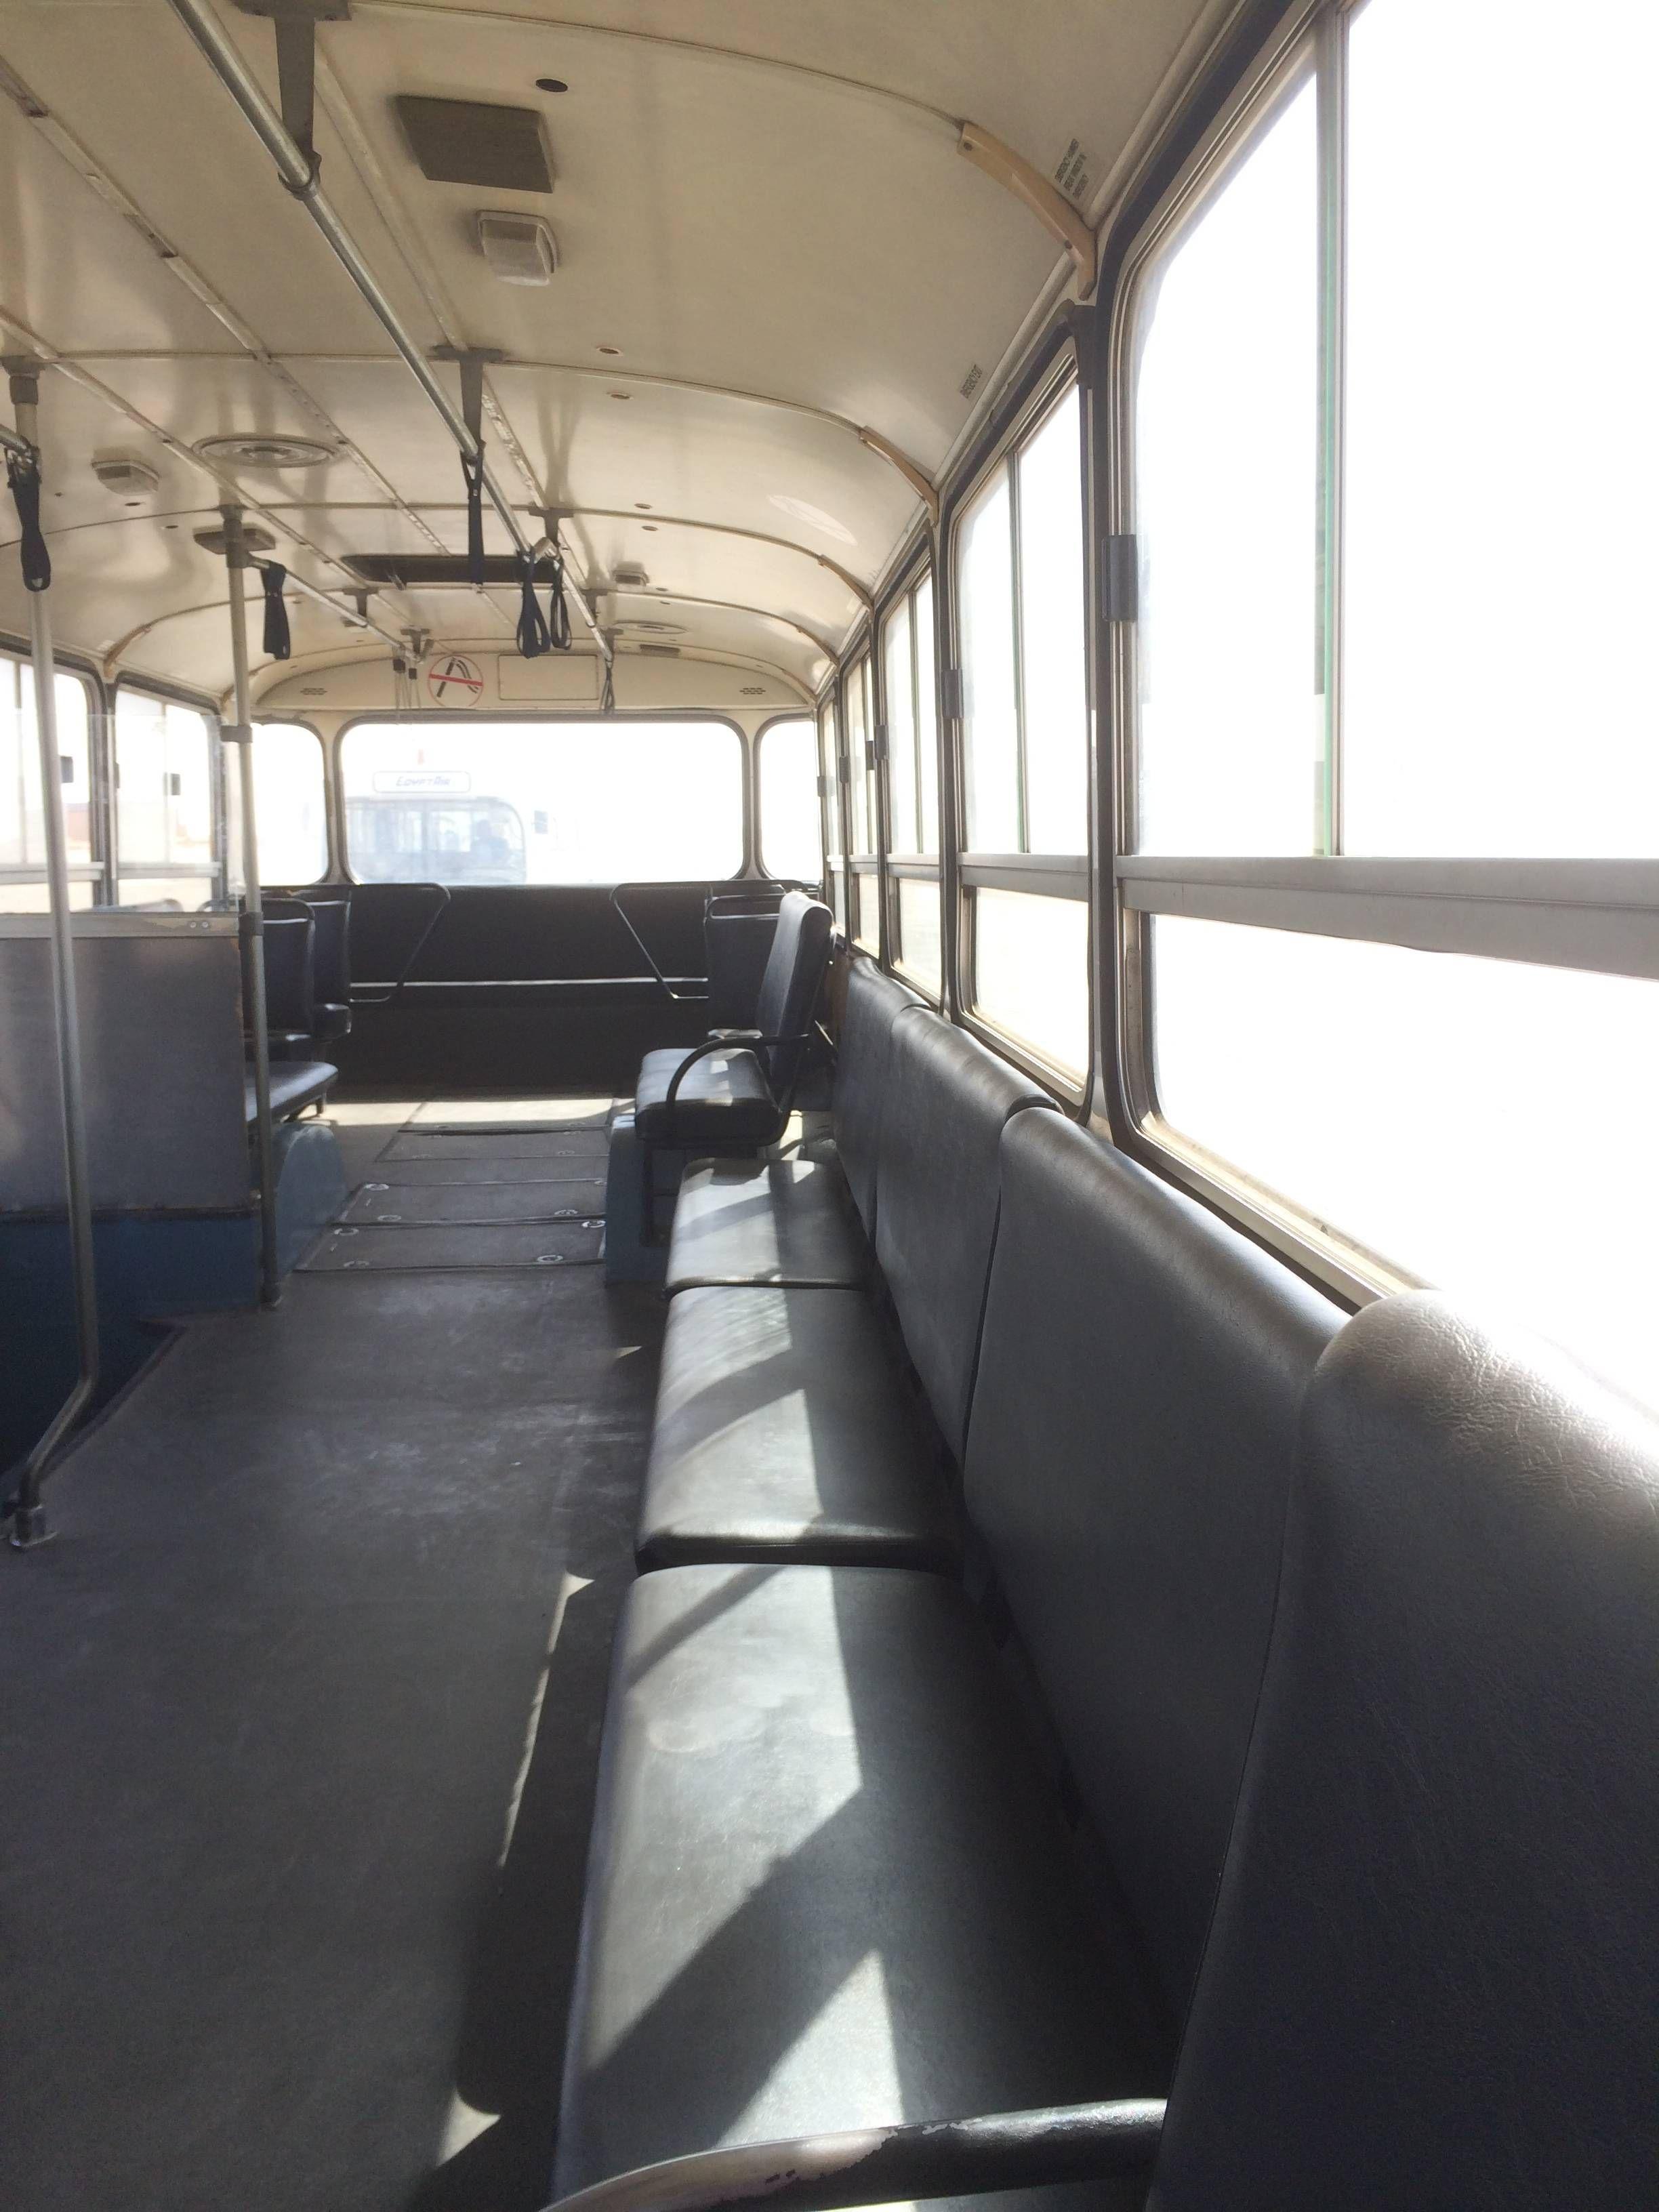 egyptair business class bus